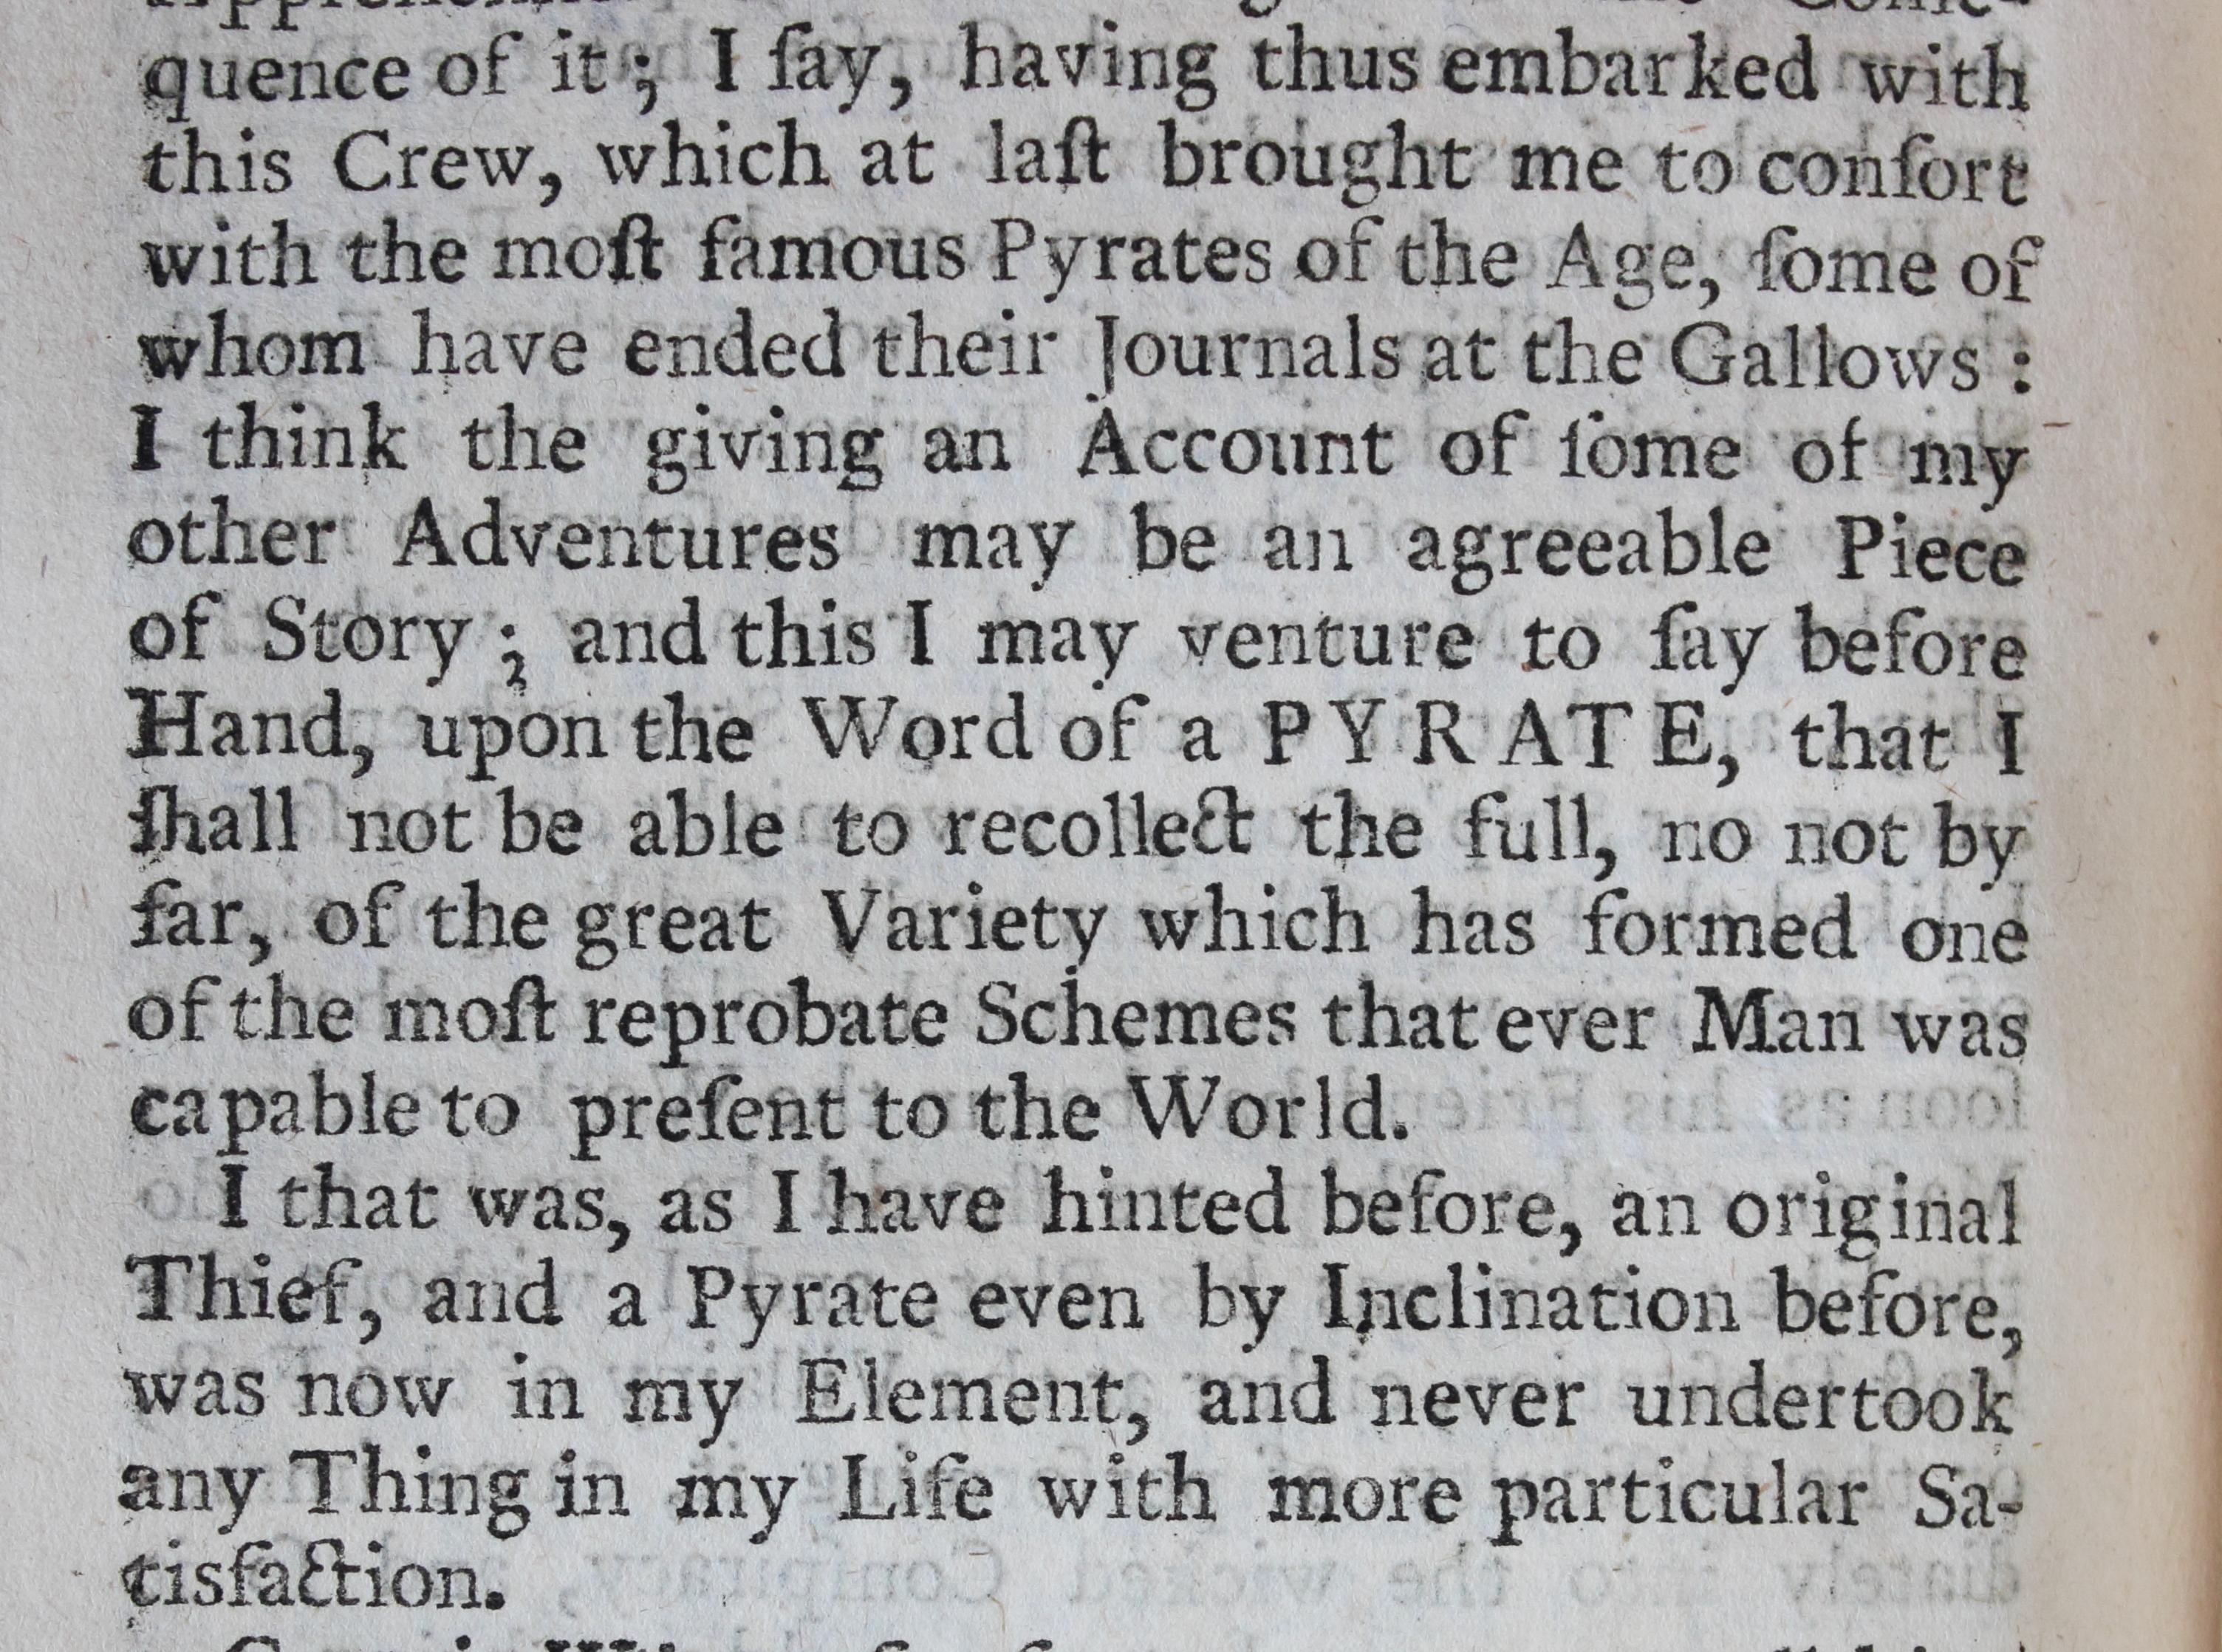 Thackeray.VIII.11.11 page 182 extract